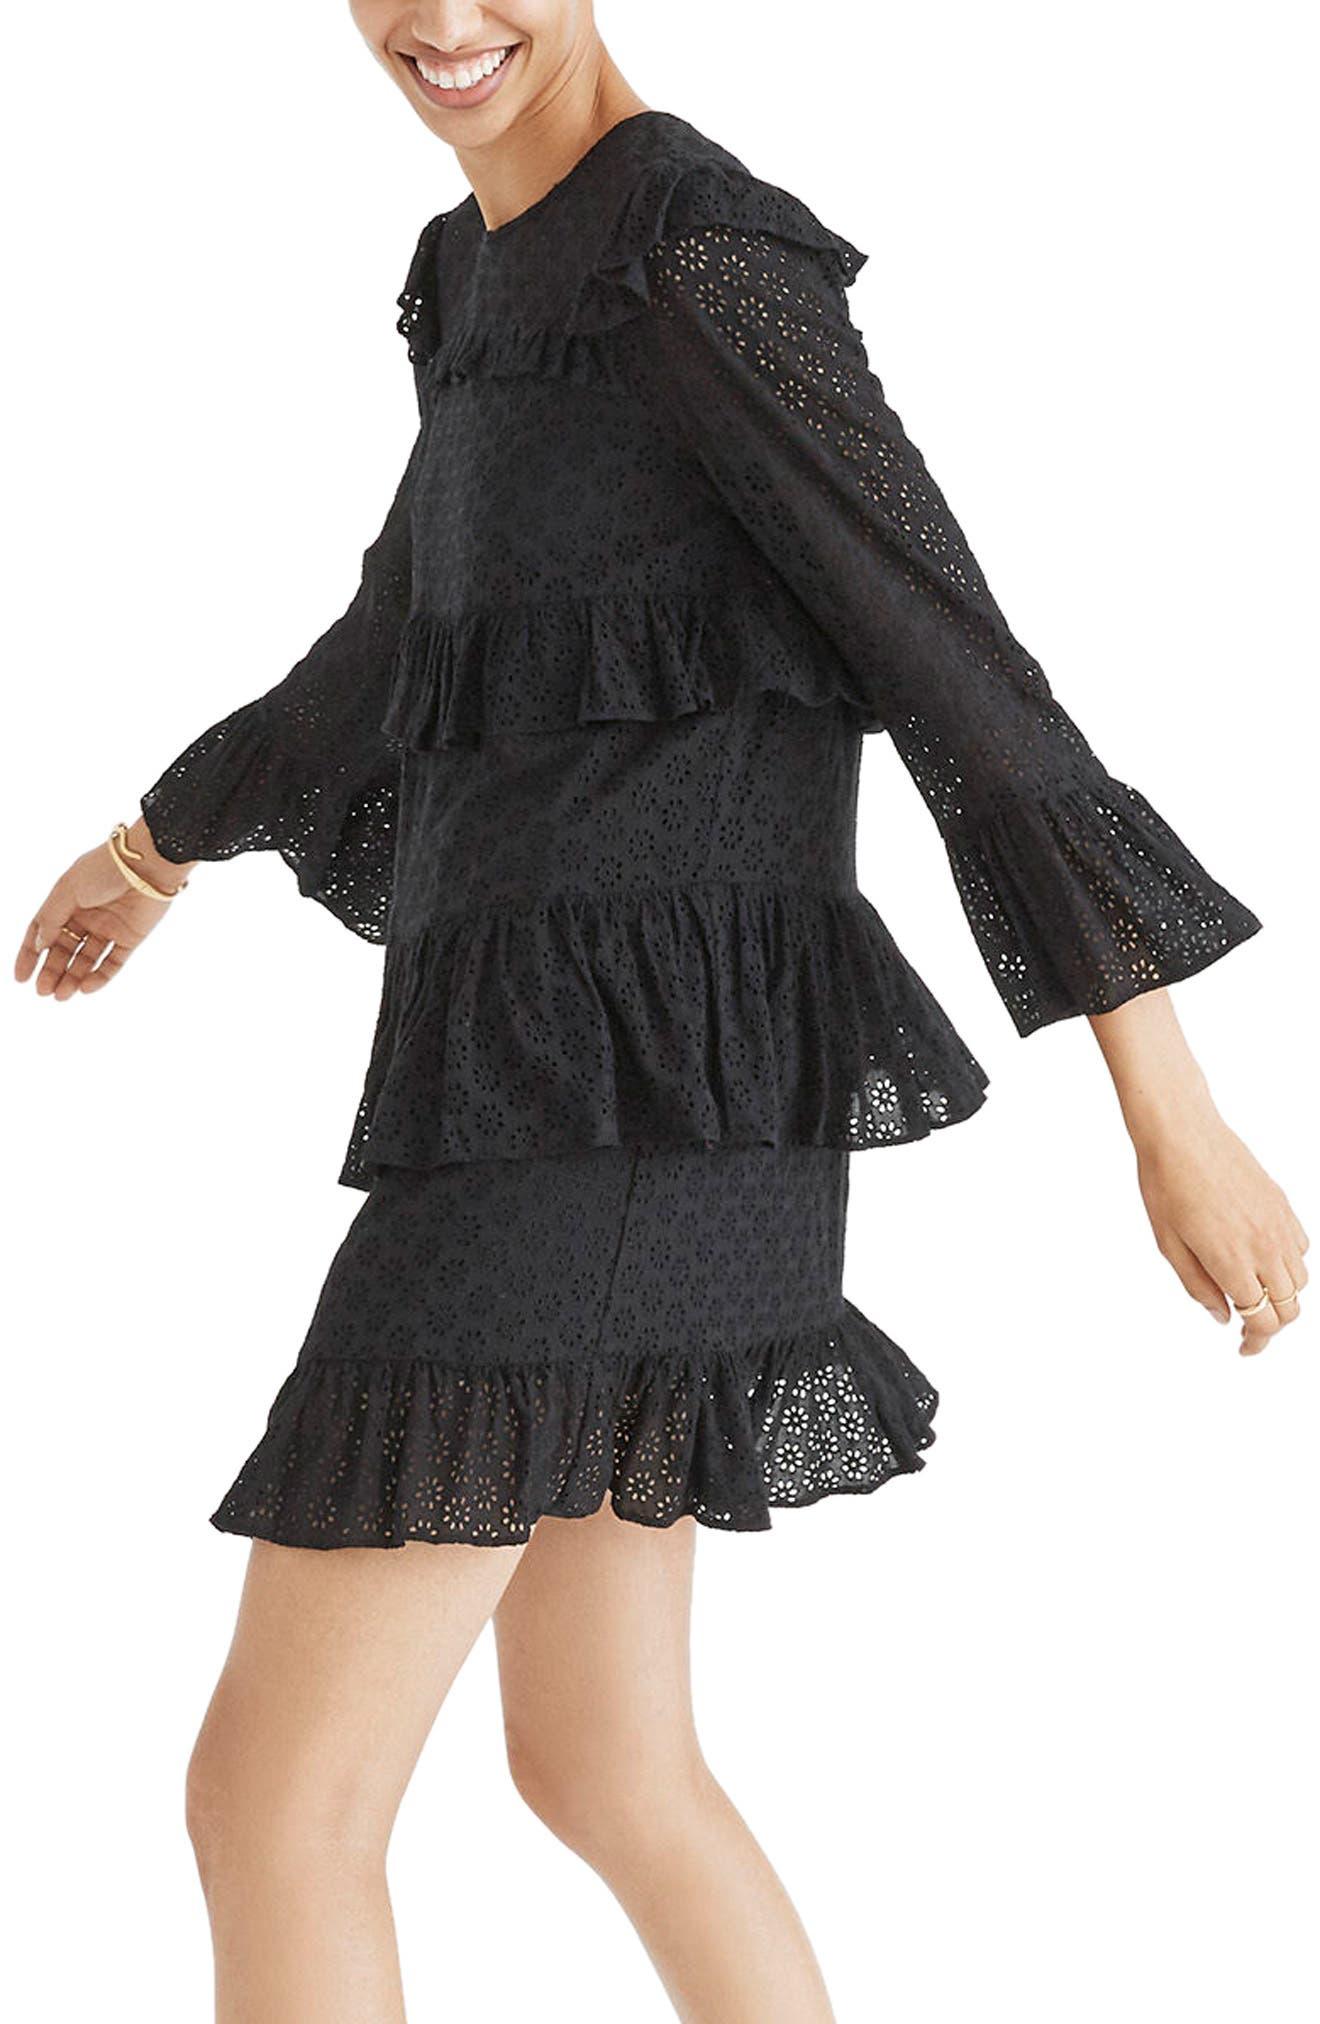 Waterlily Ruffle Eyelet Dress,                         Main,                         color, True Black